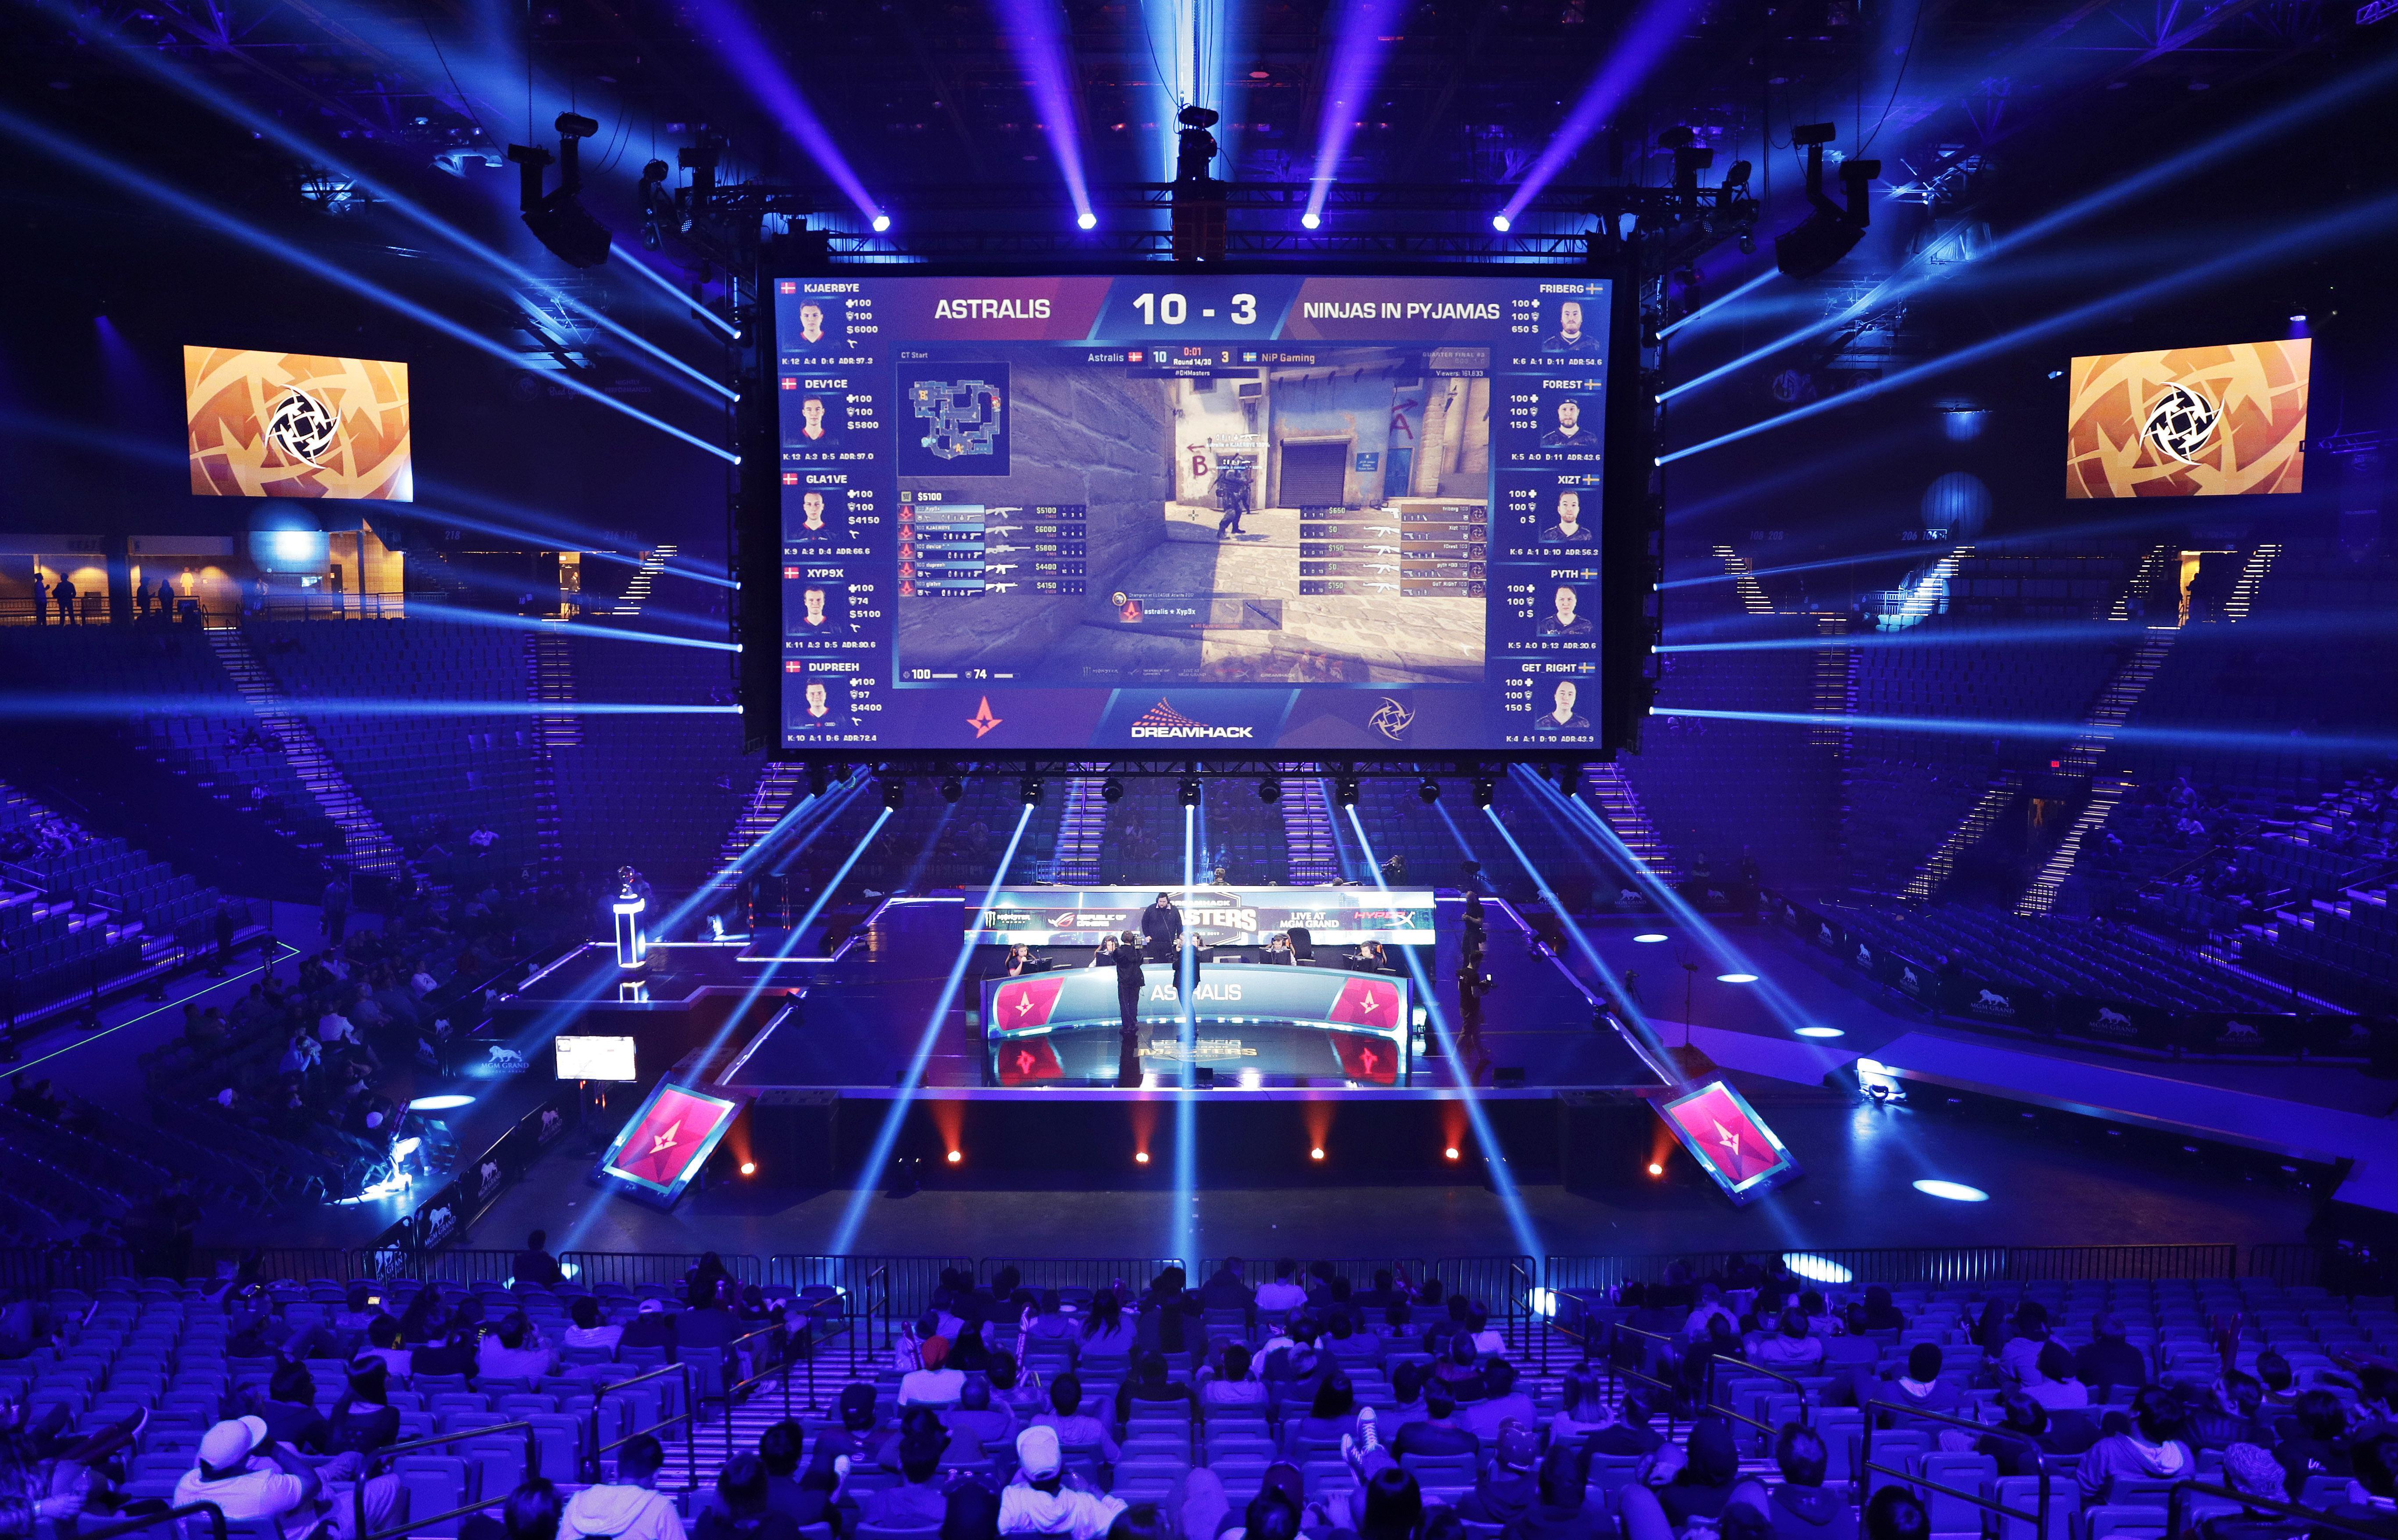 Vegas Strip Getting Esports Arena With Nightclub Overhaul